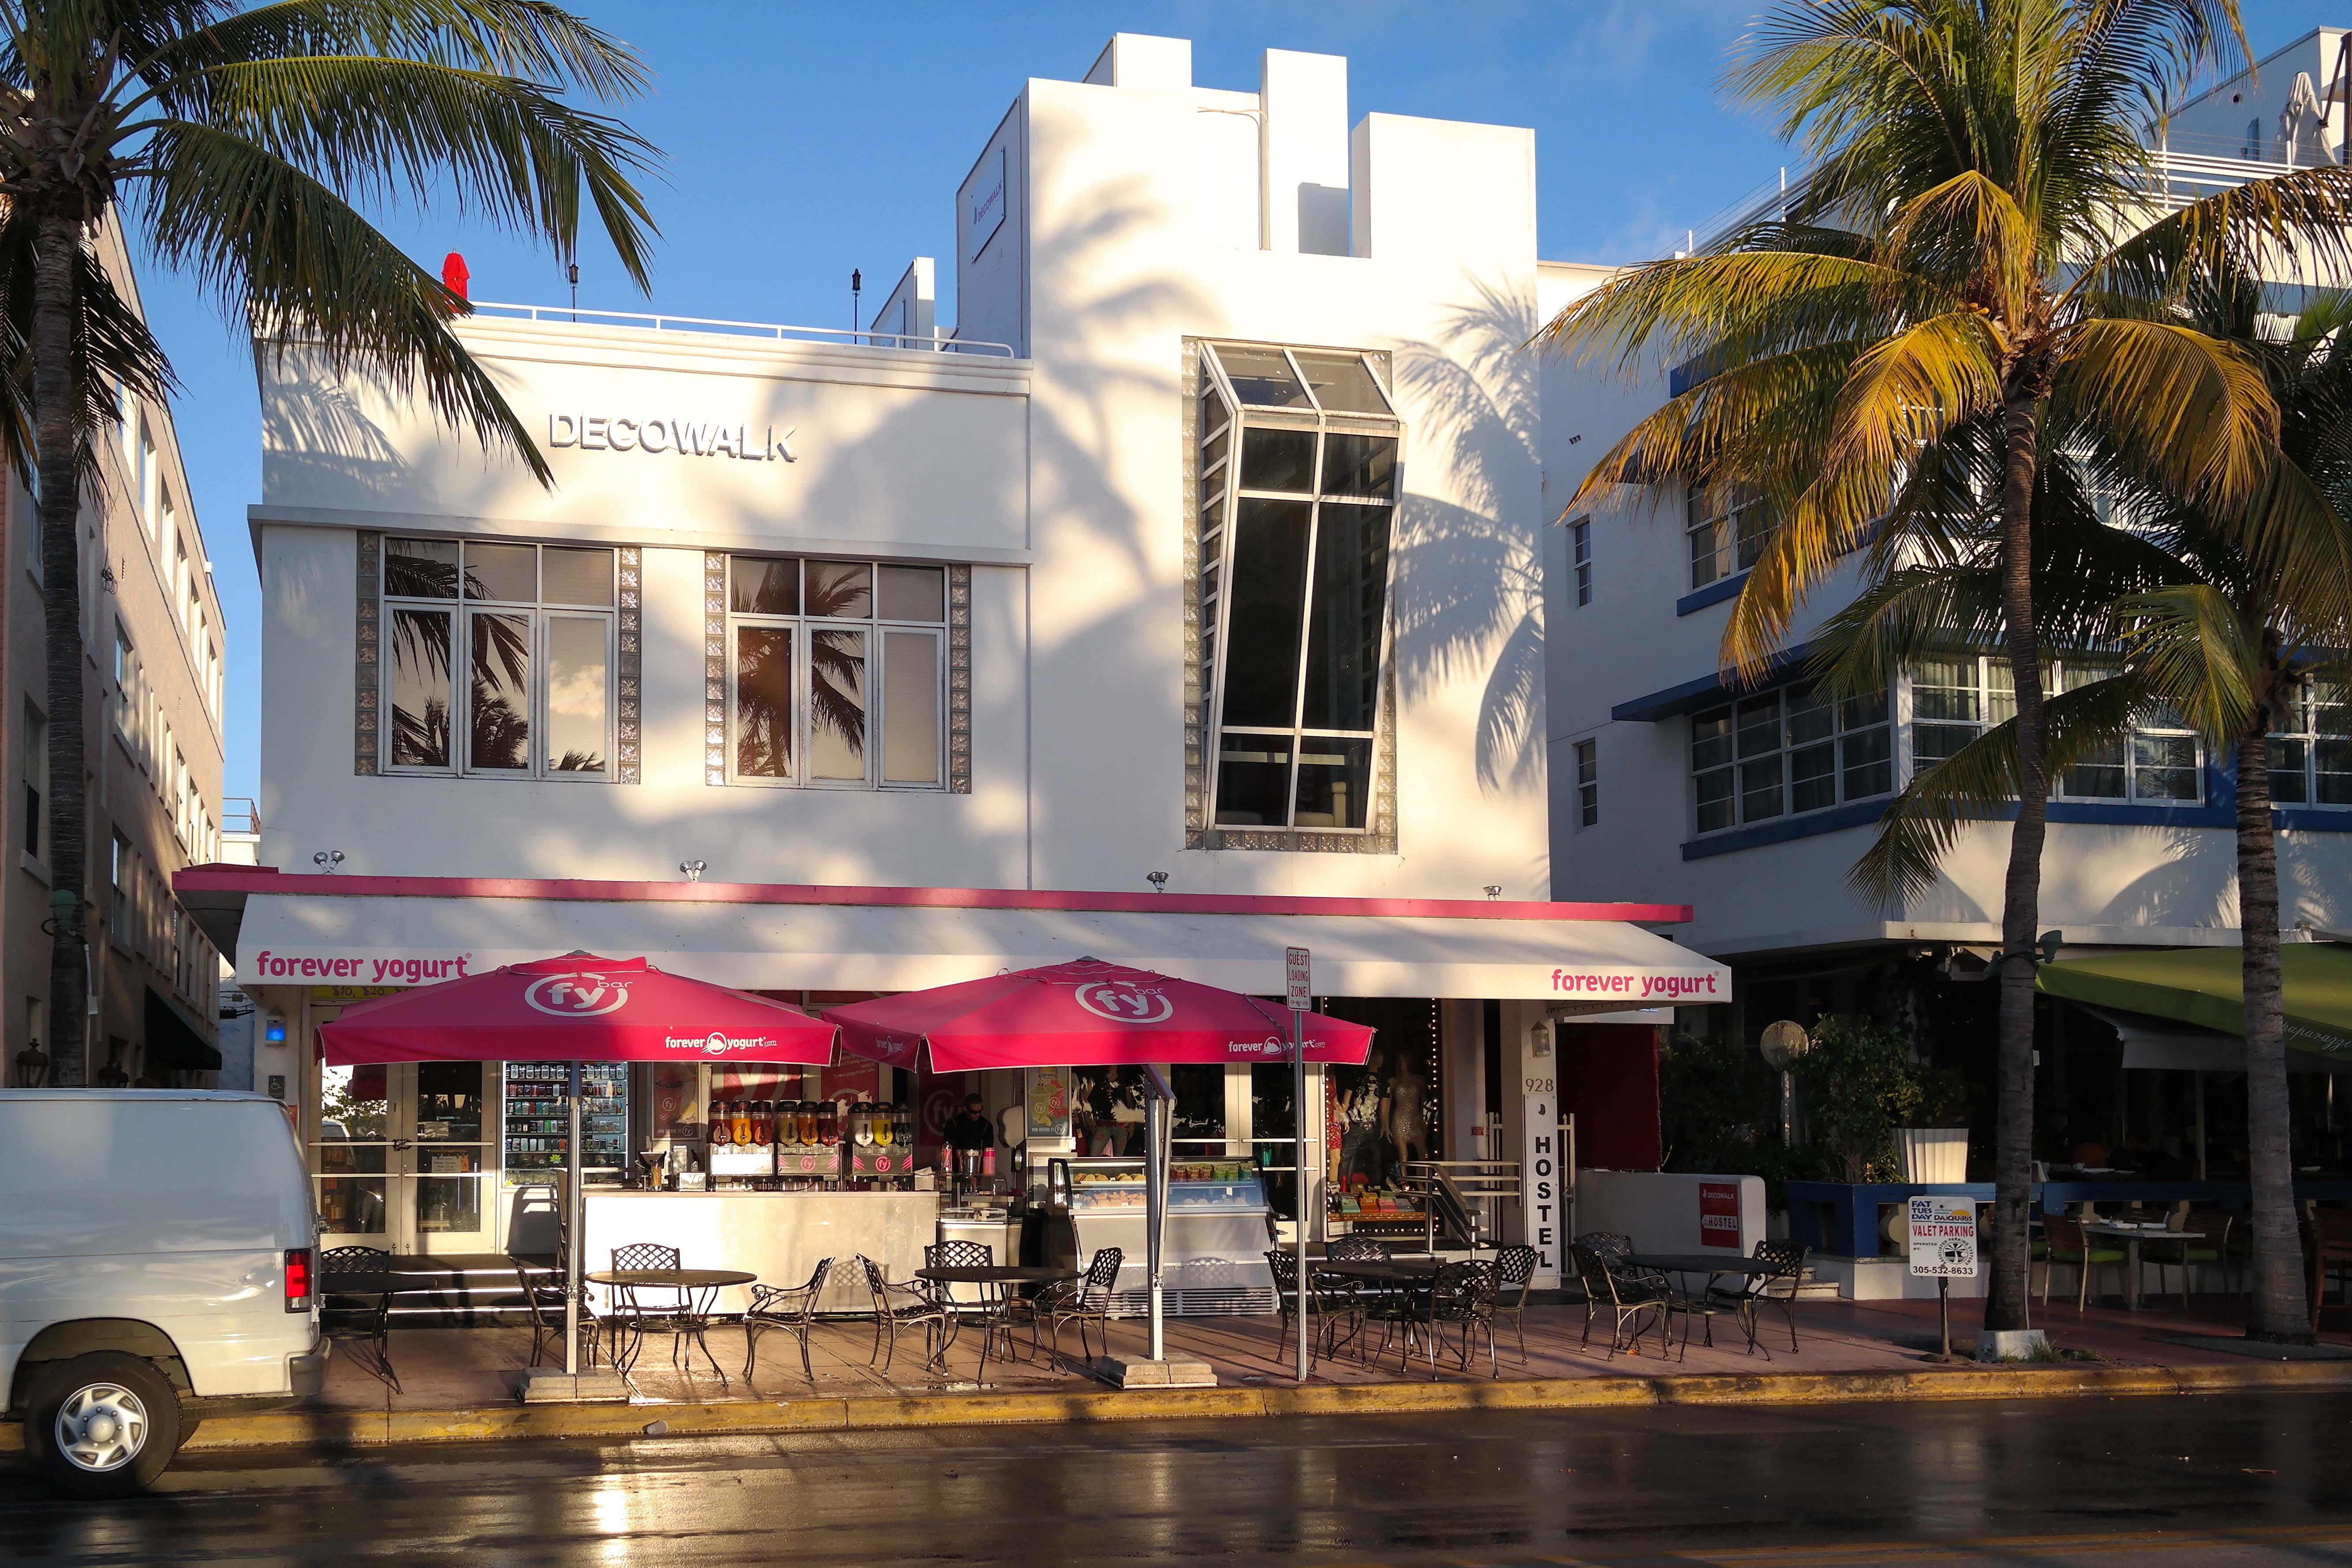 Deco Walk Hostel South Beach